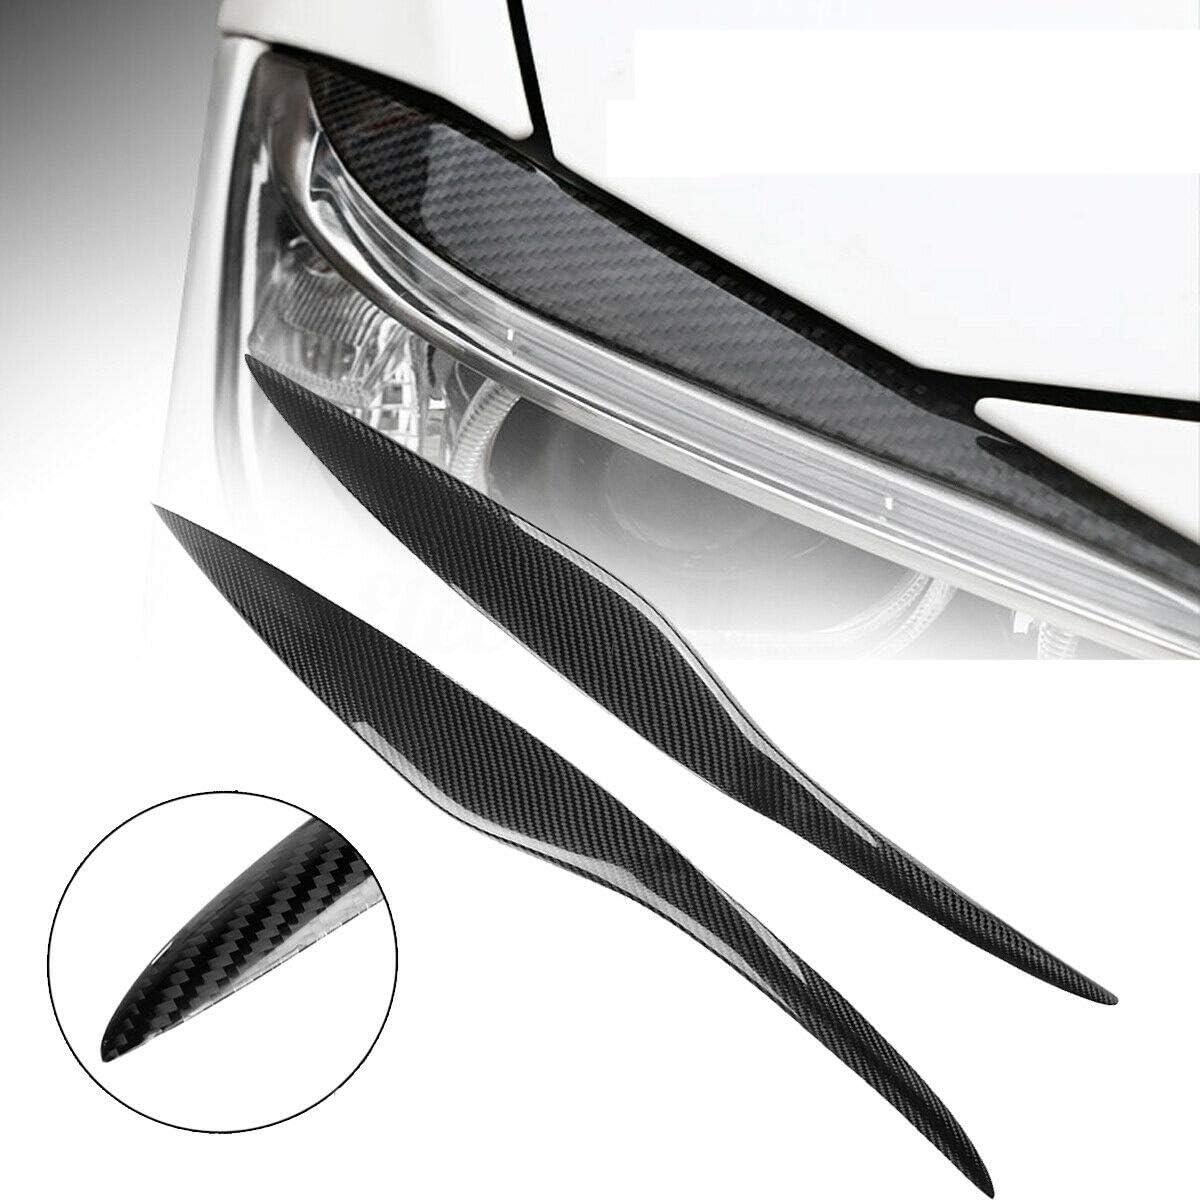 Lopbinte Carbon Fiber Headlight Eyebrows Cover Trim for Fiesta MARK VI Pre-Facelift 2009-2012